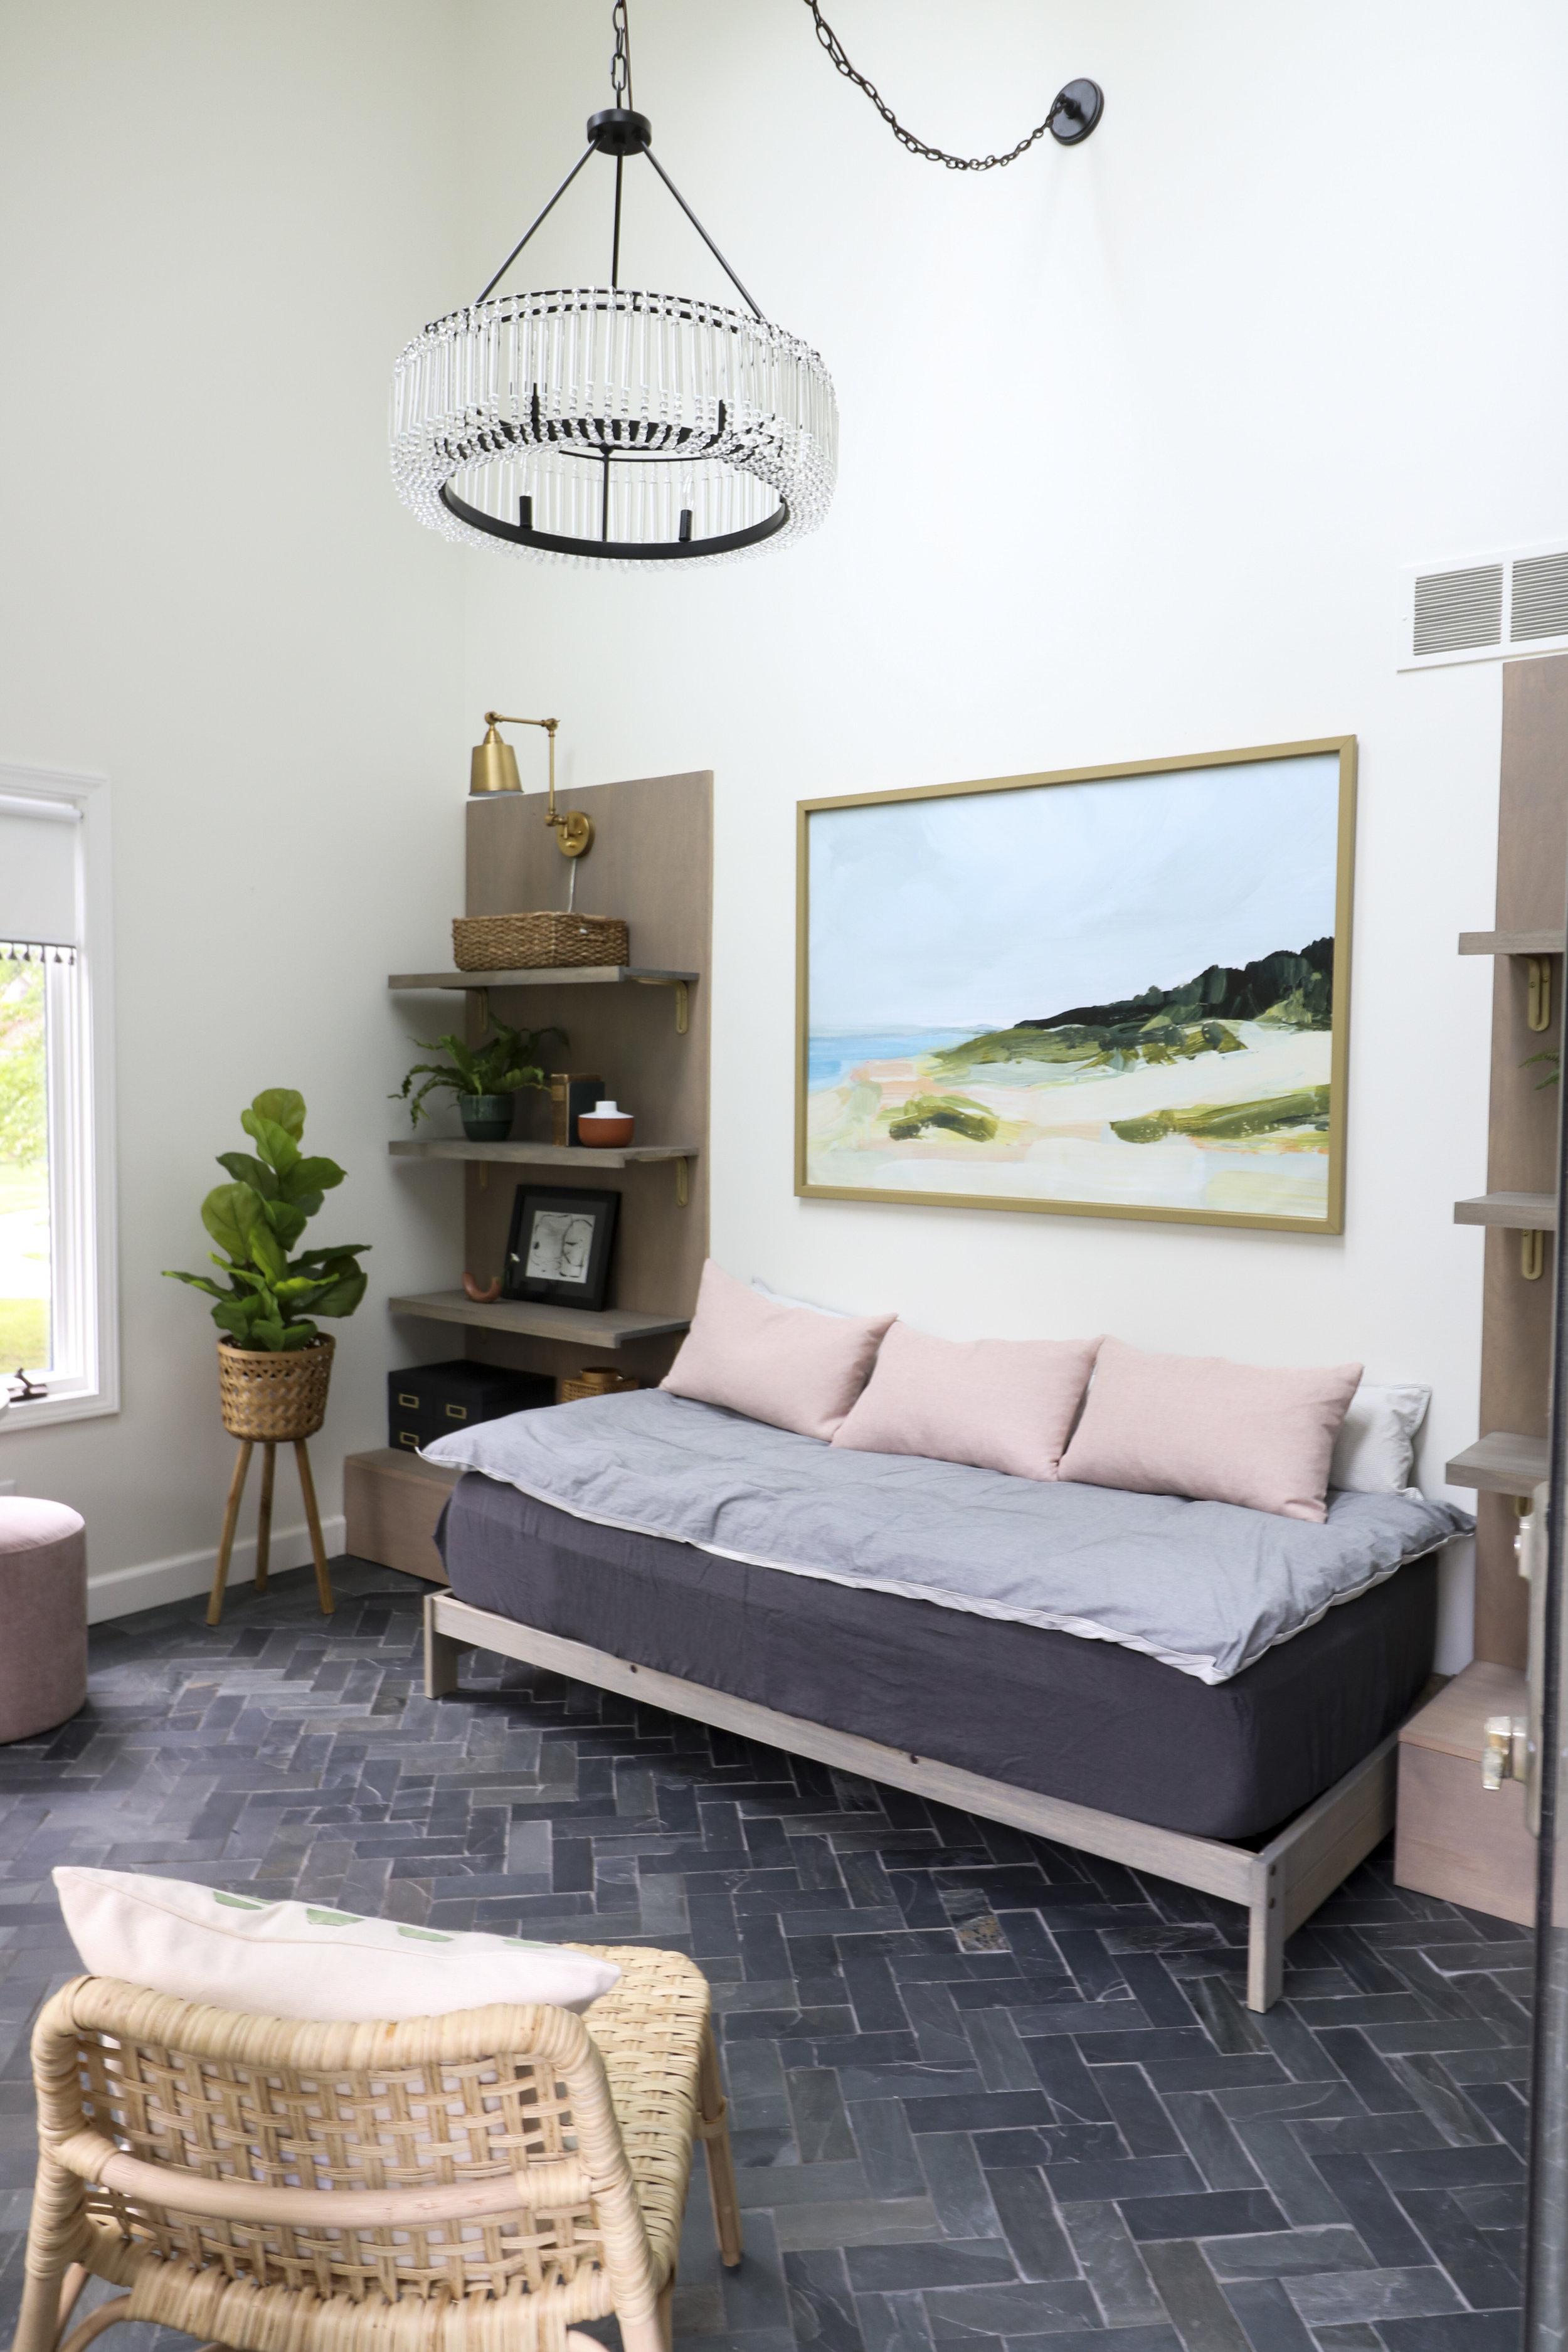 Chandelier  |  Slate Tile